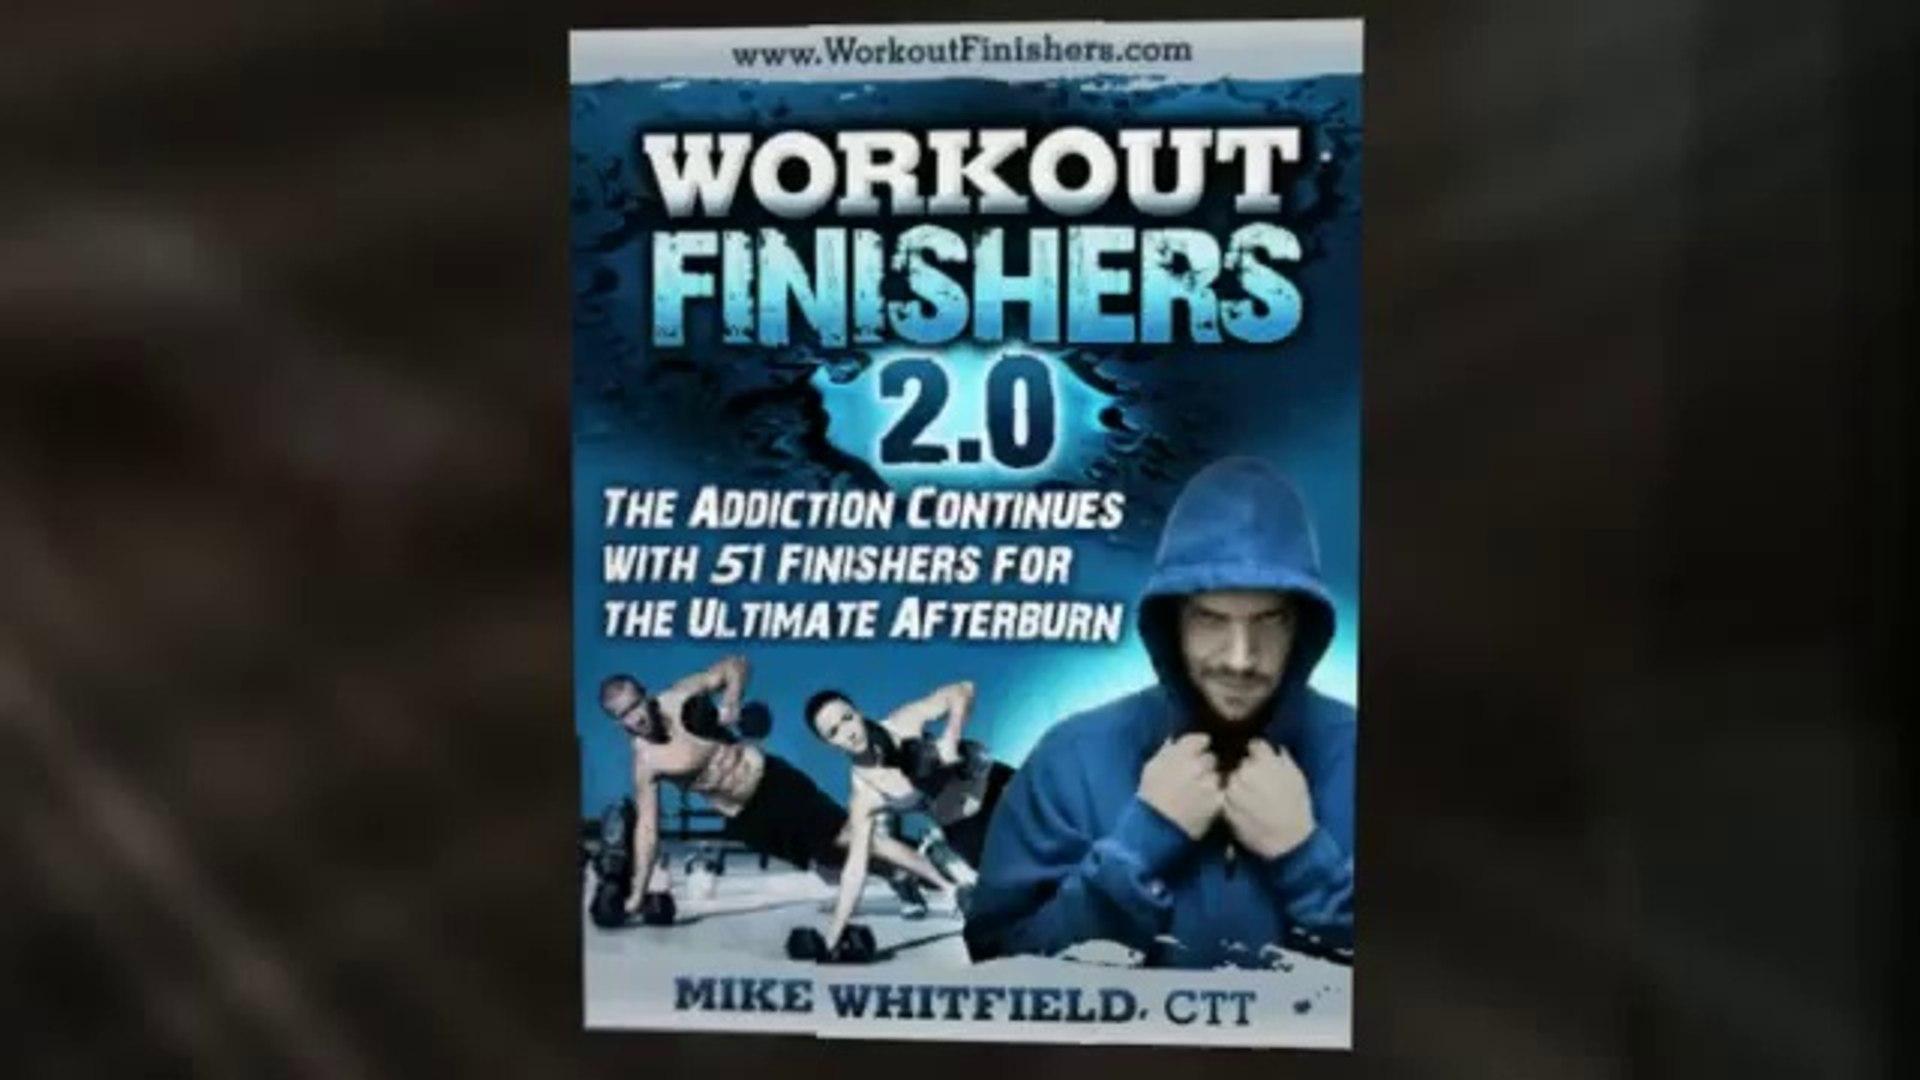 Workout Finishers System